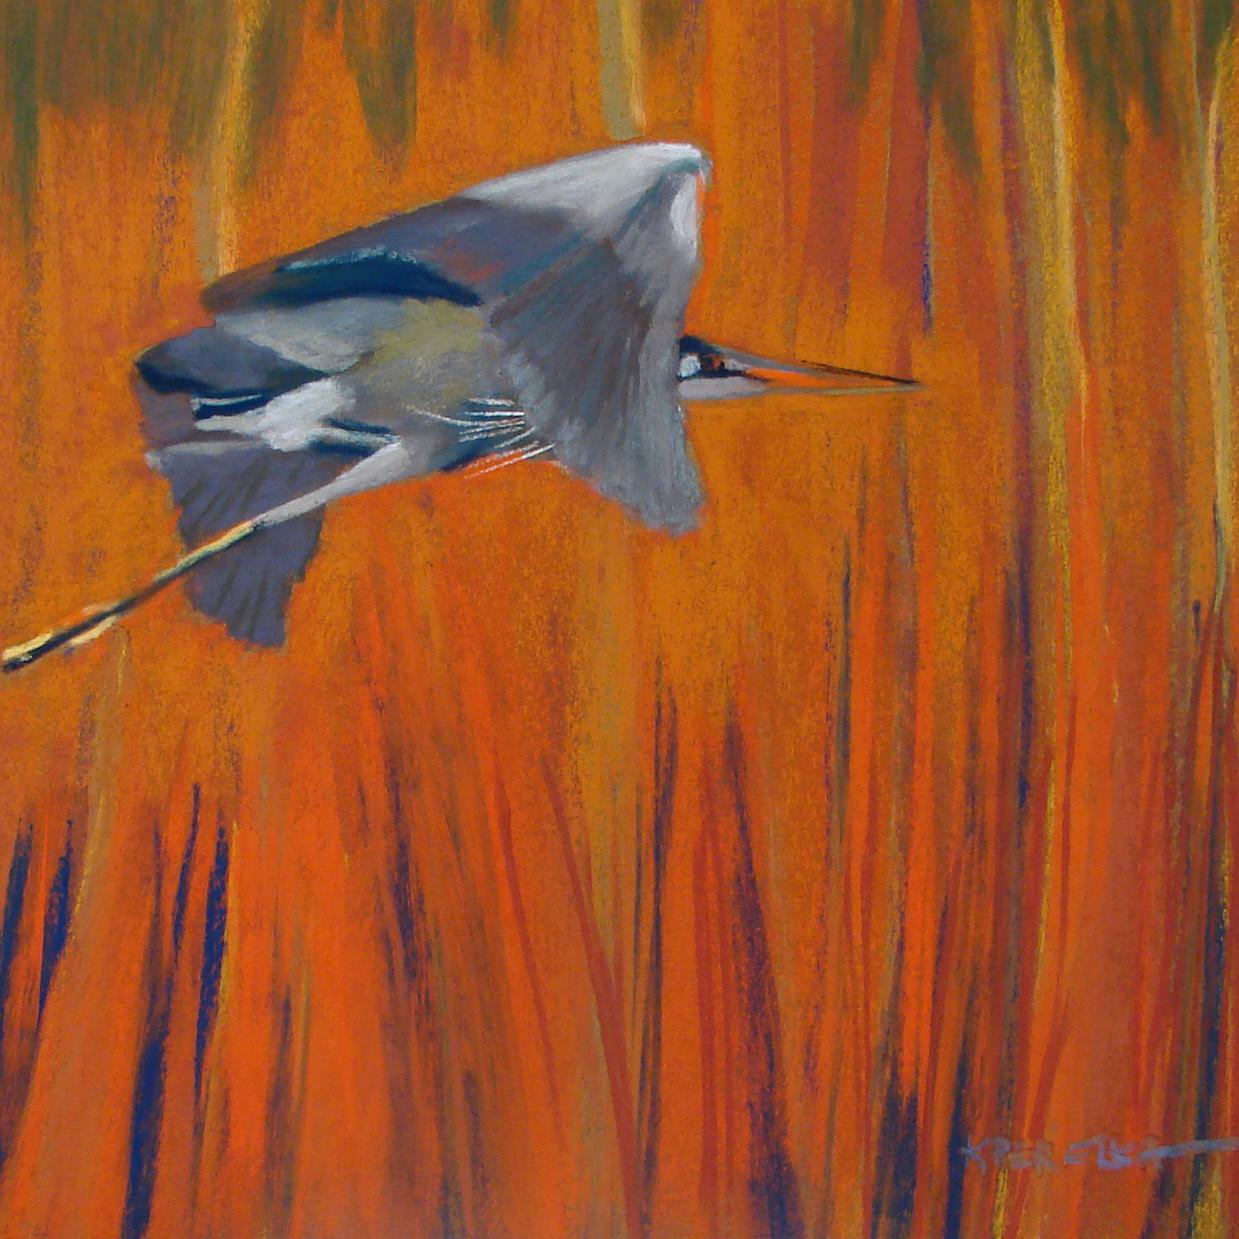 """Blue Heron"" 12x12"